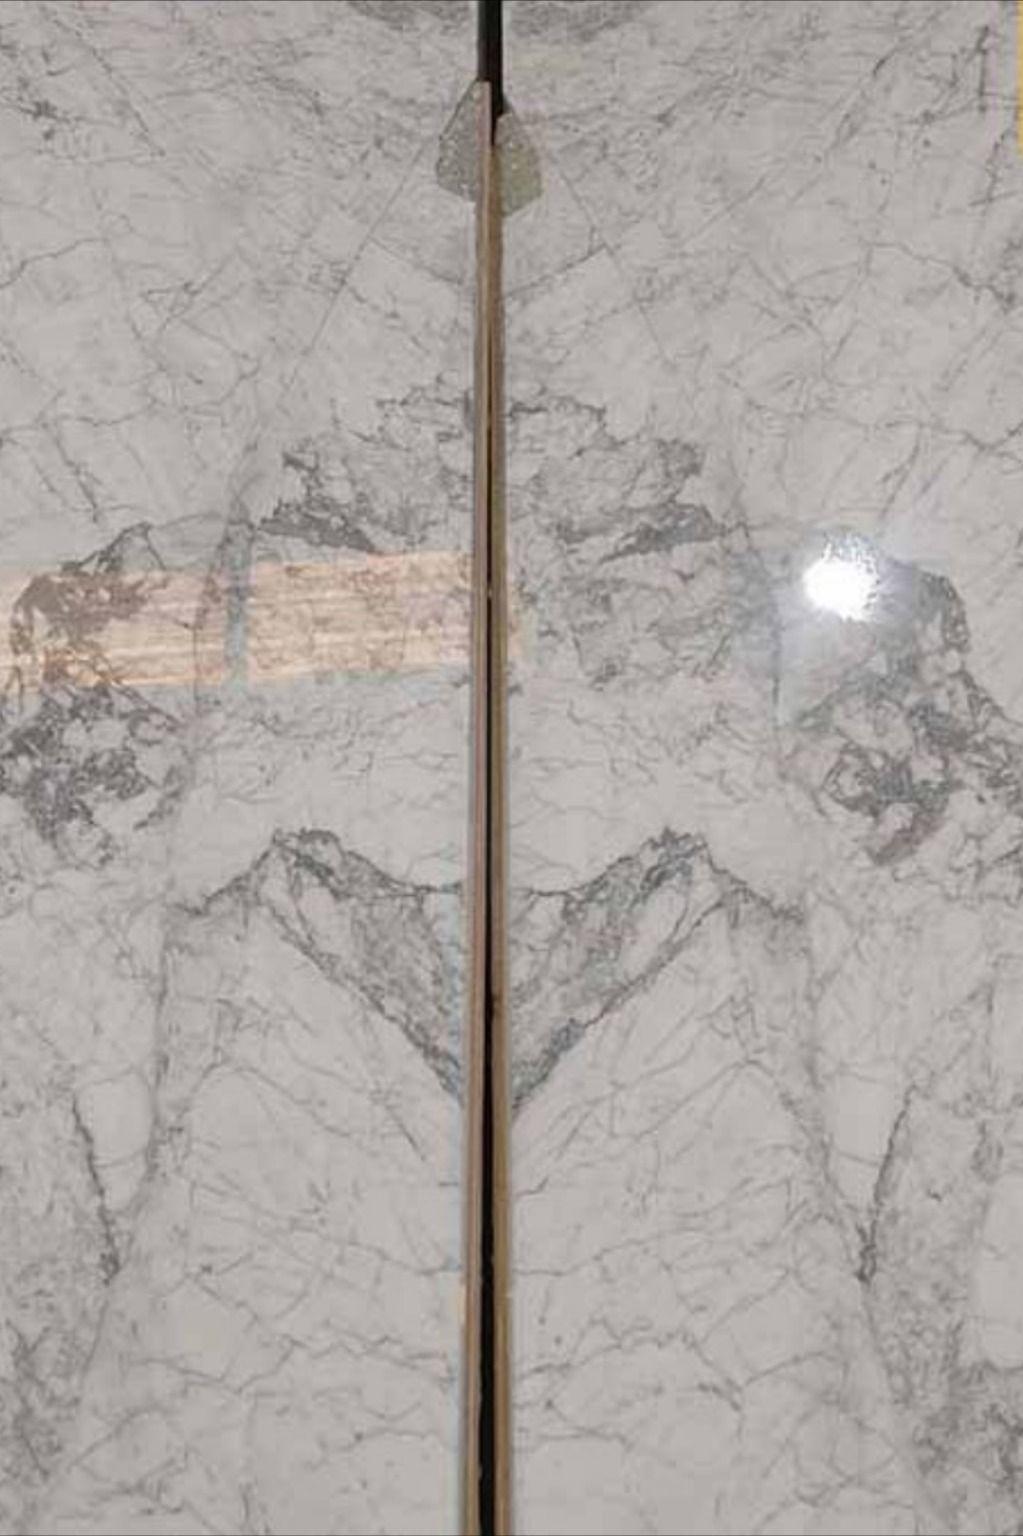 انواع الرخام المتوفر بالسعودية بالصور Marble Dream House House